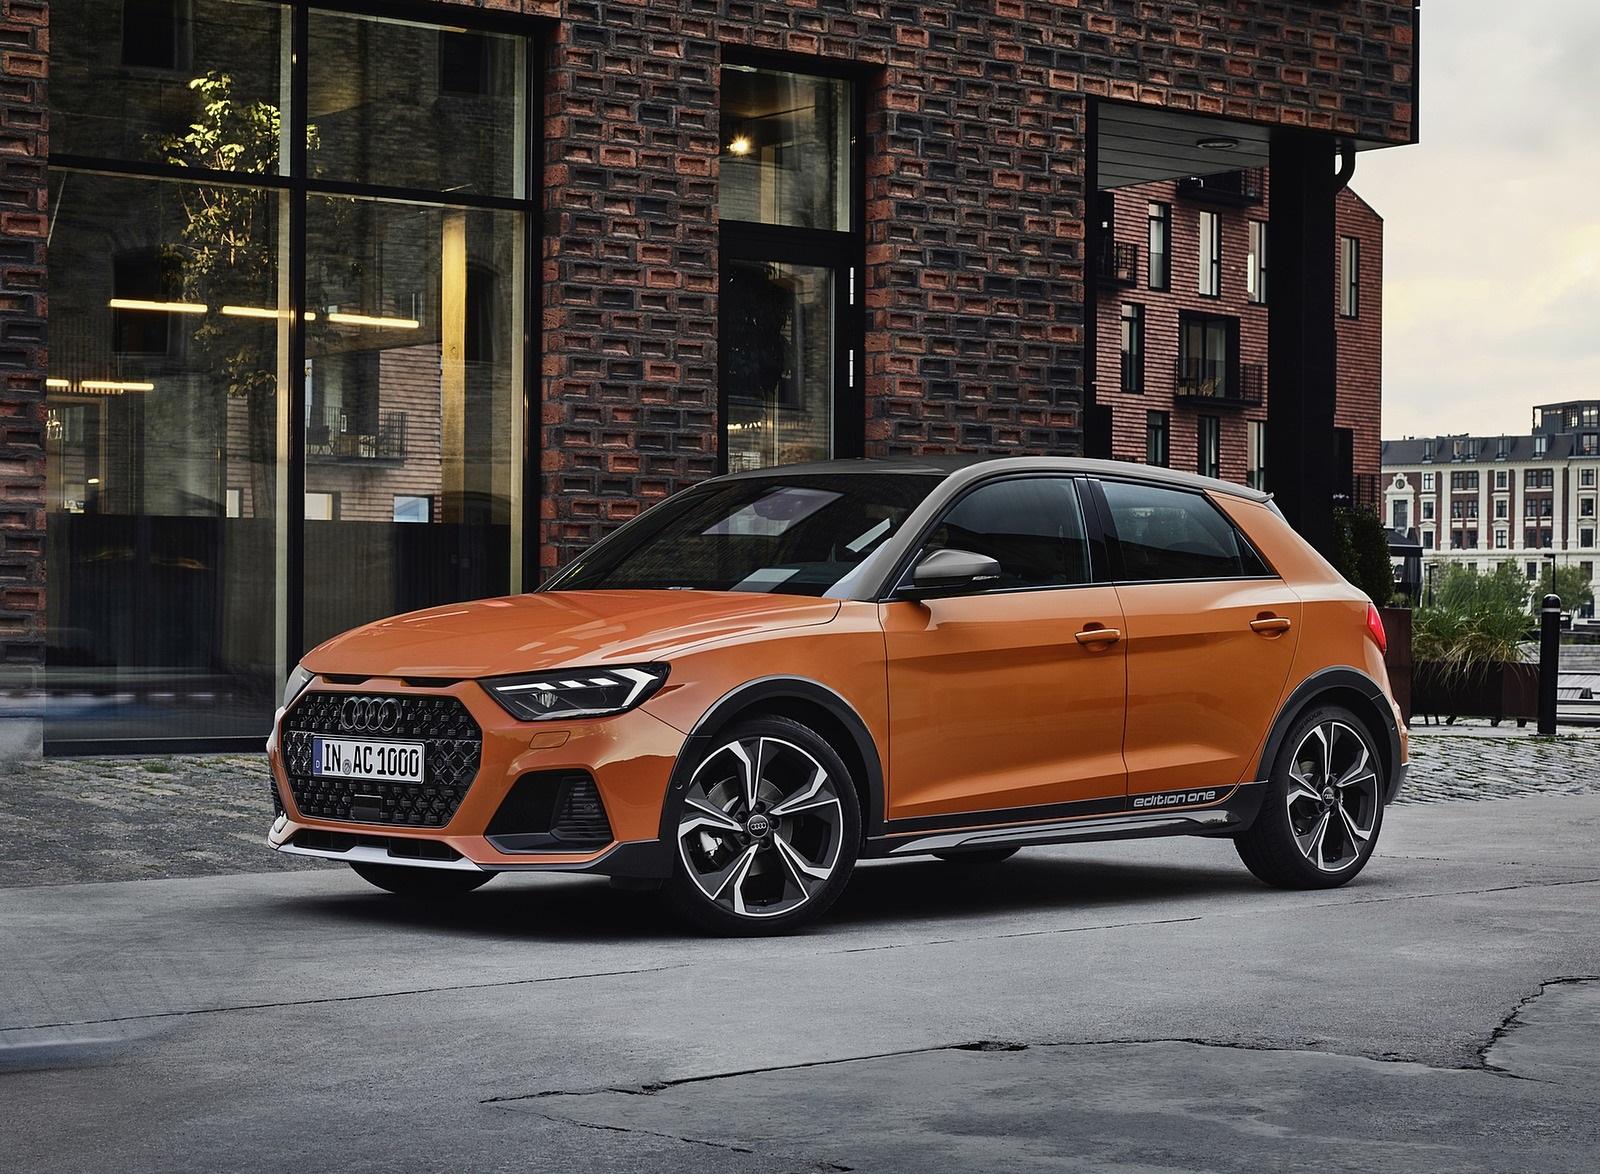 2020 Audi A1 Citycarver (Color: Pulse Orange) Front Three-Quarter Wallpapers (14)